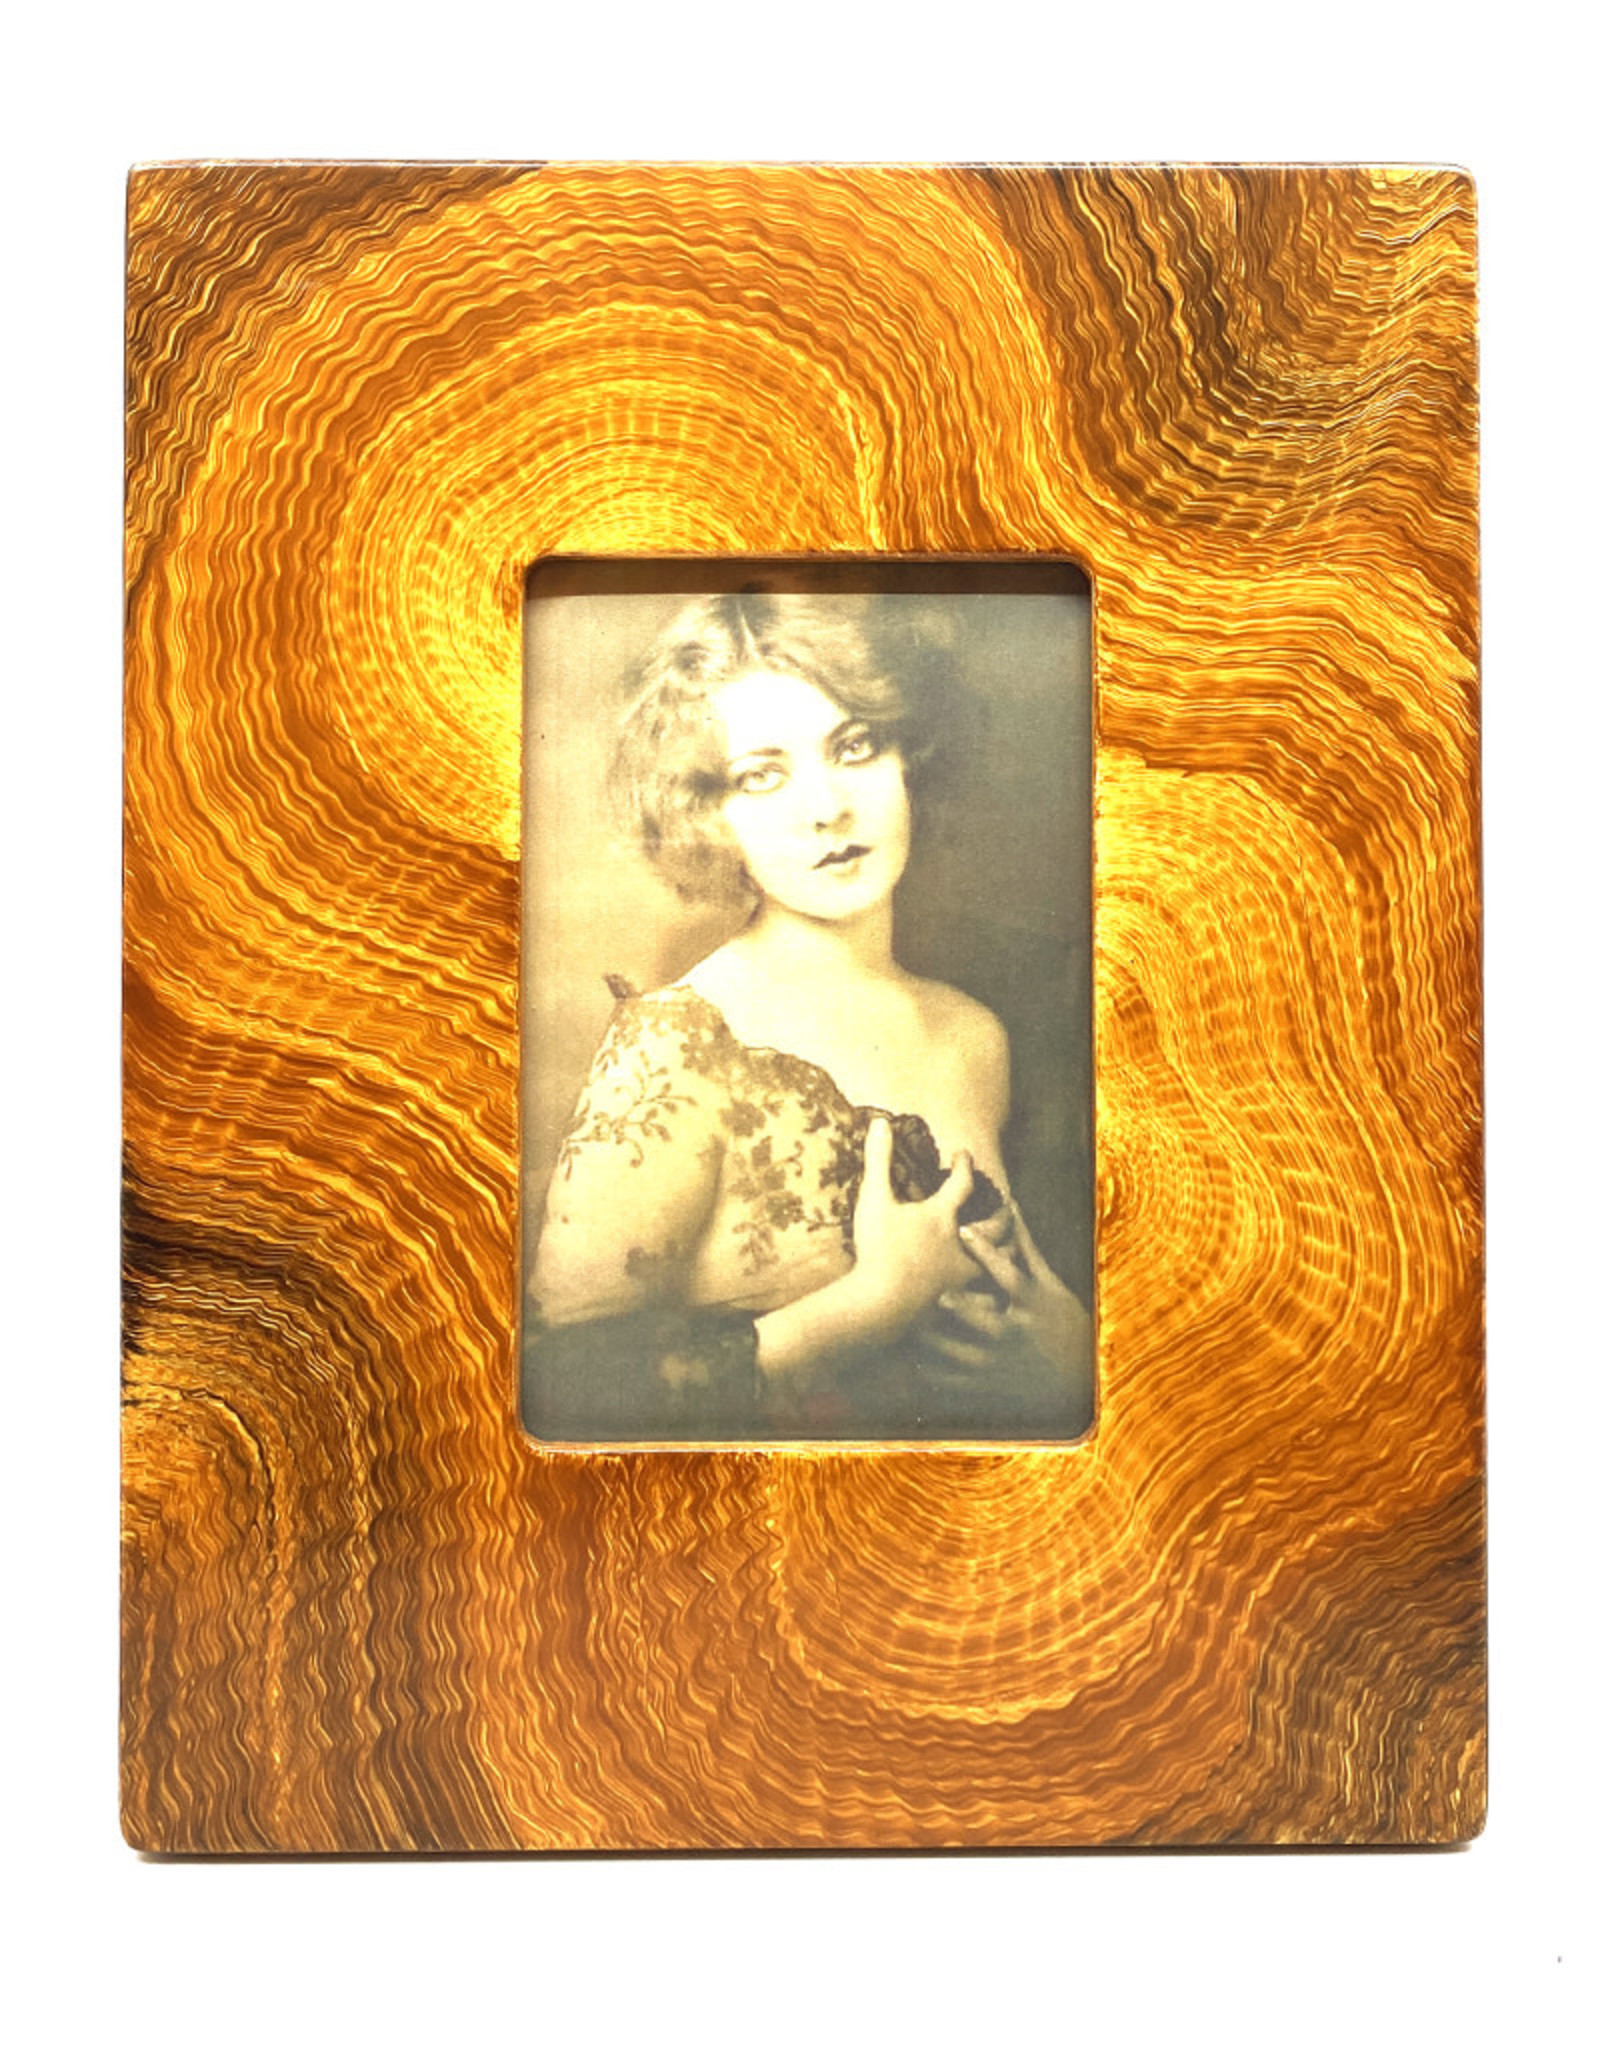 GRANT-NOREN 4X6 INFINITY GRAIN PICTURE FRAME